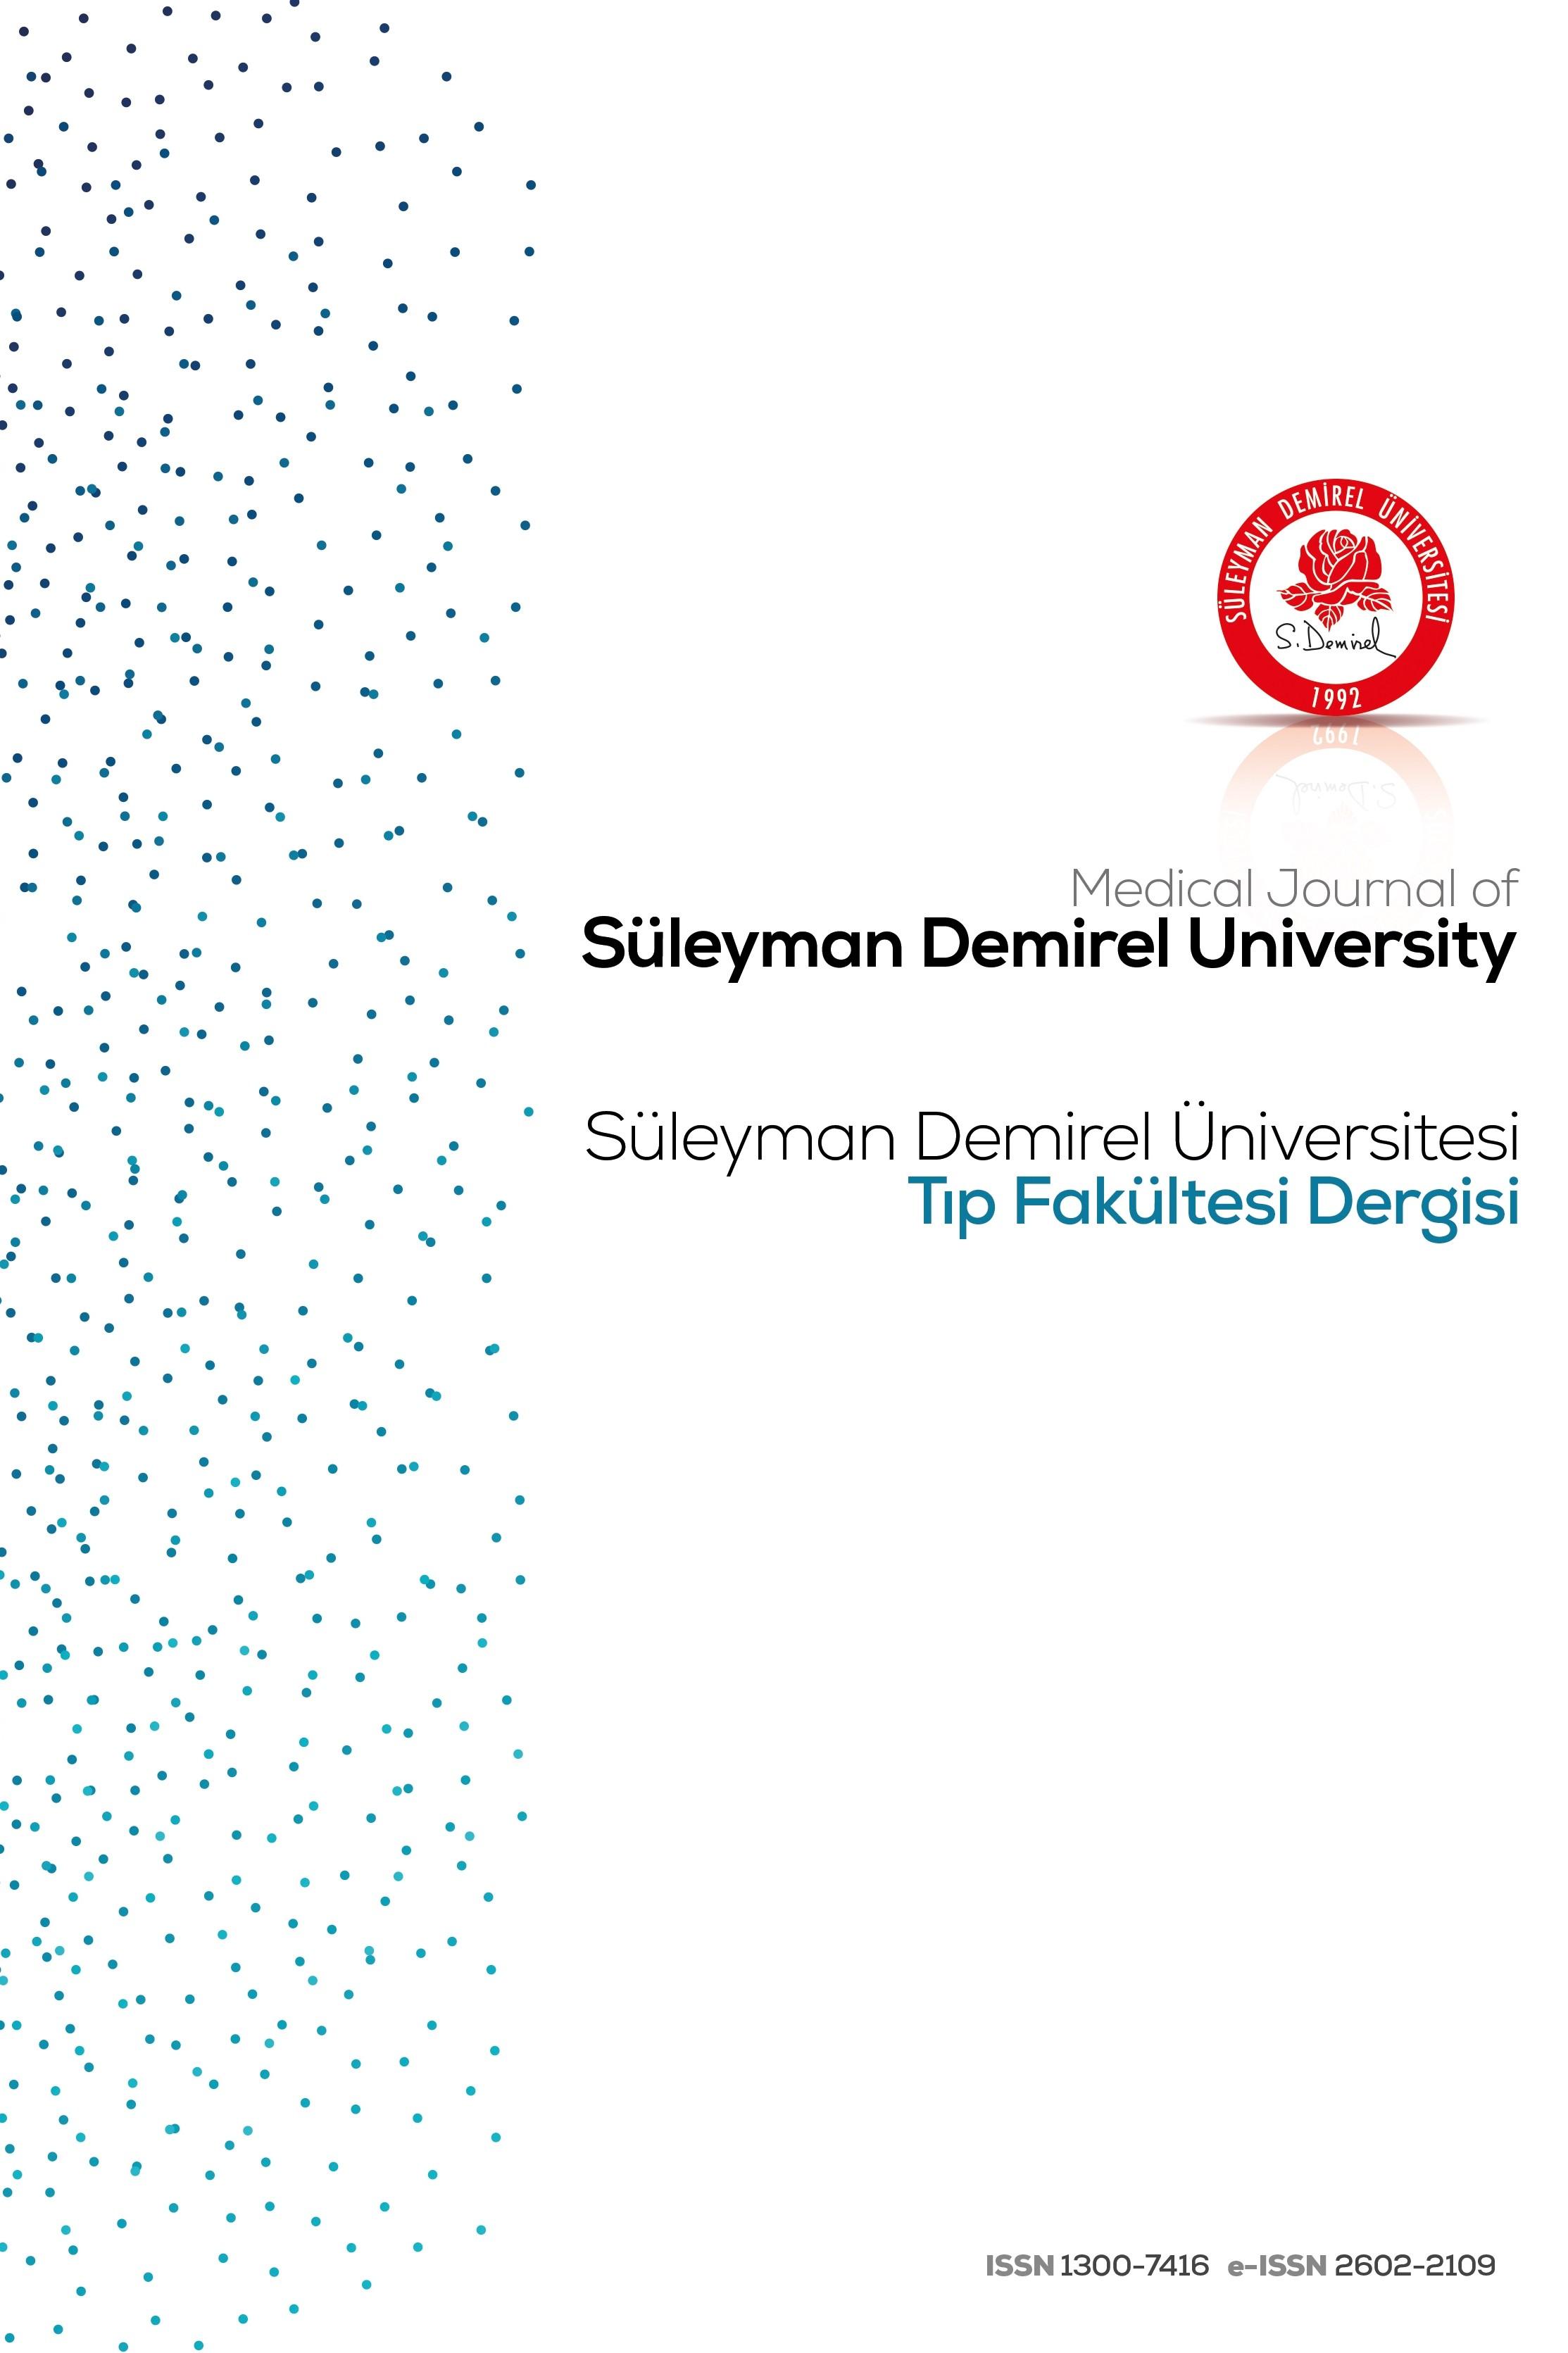 SDU Medical Faculty Journal